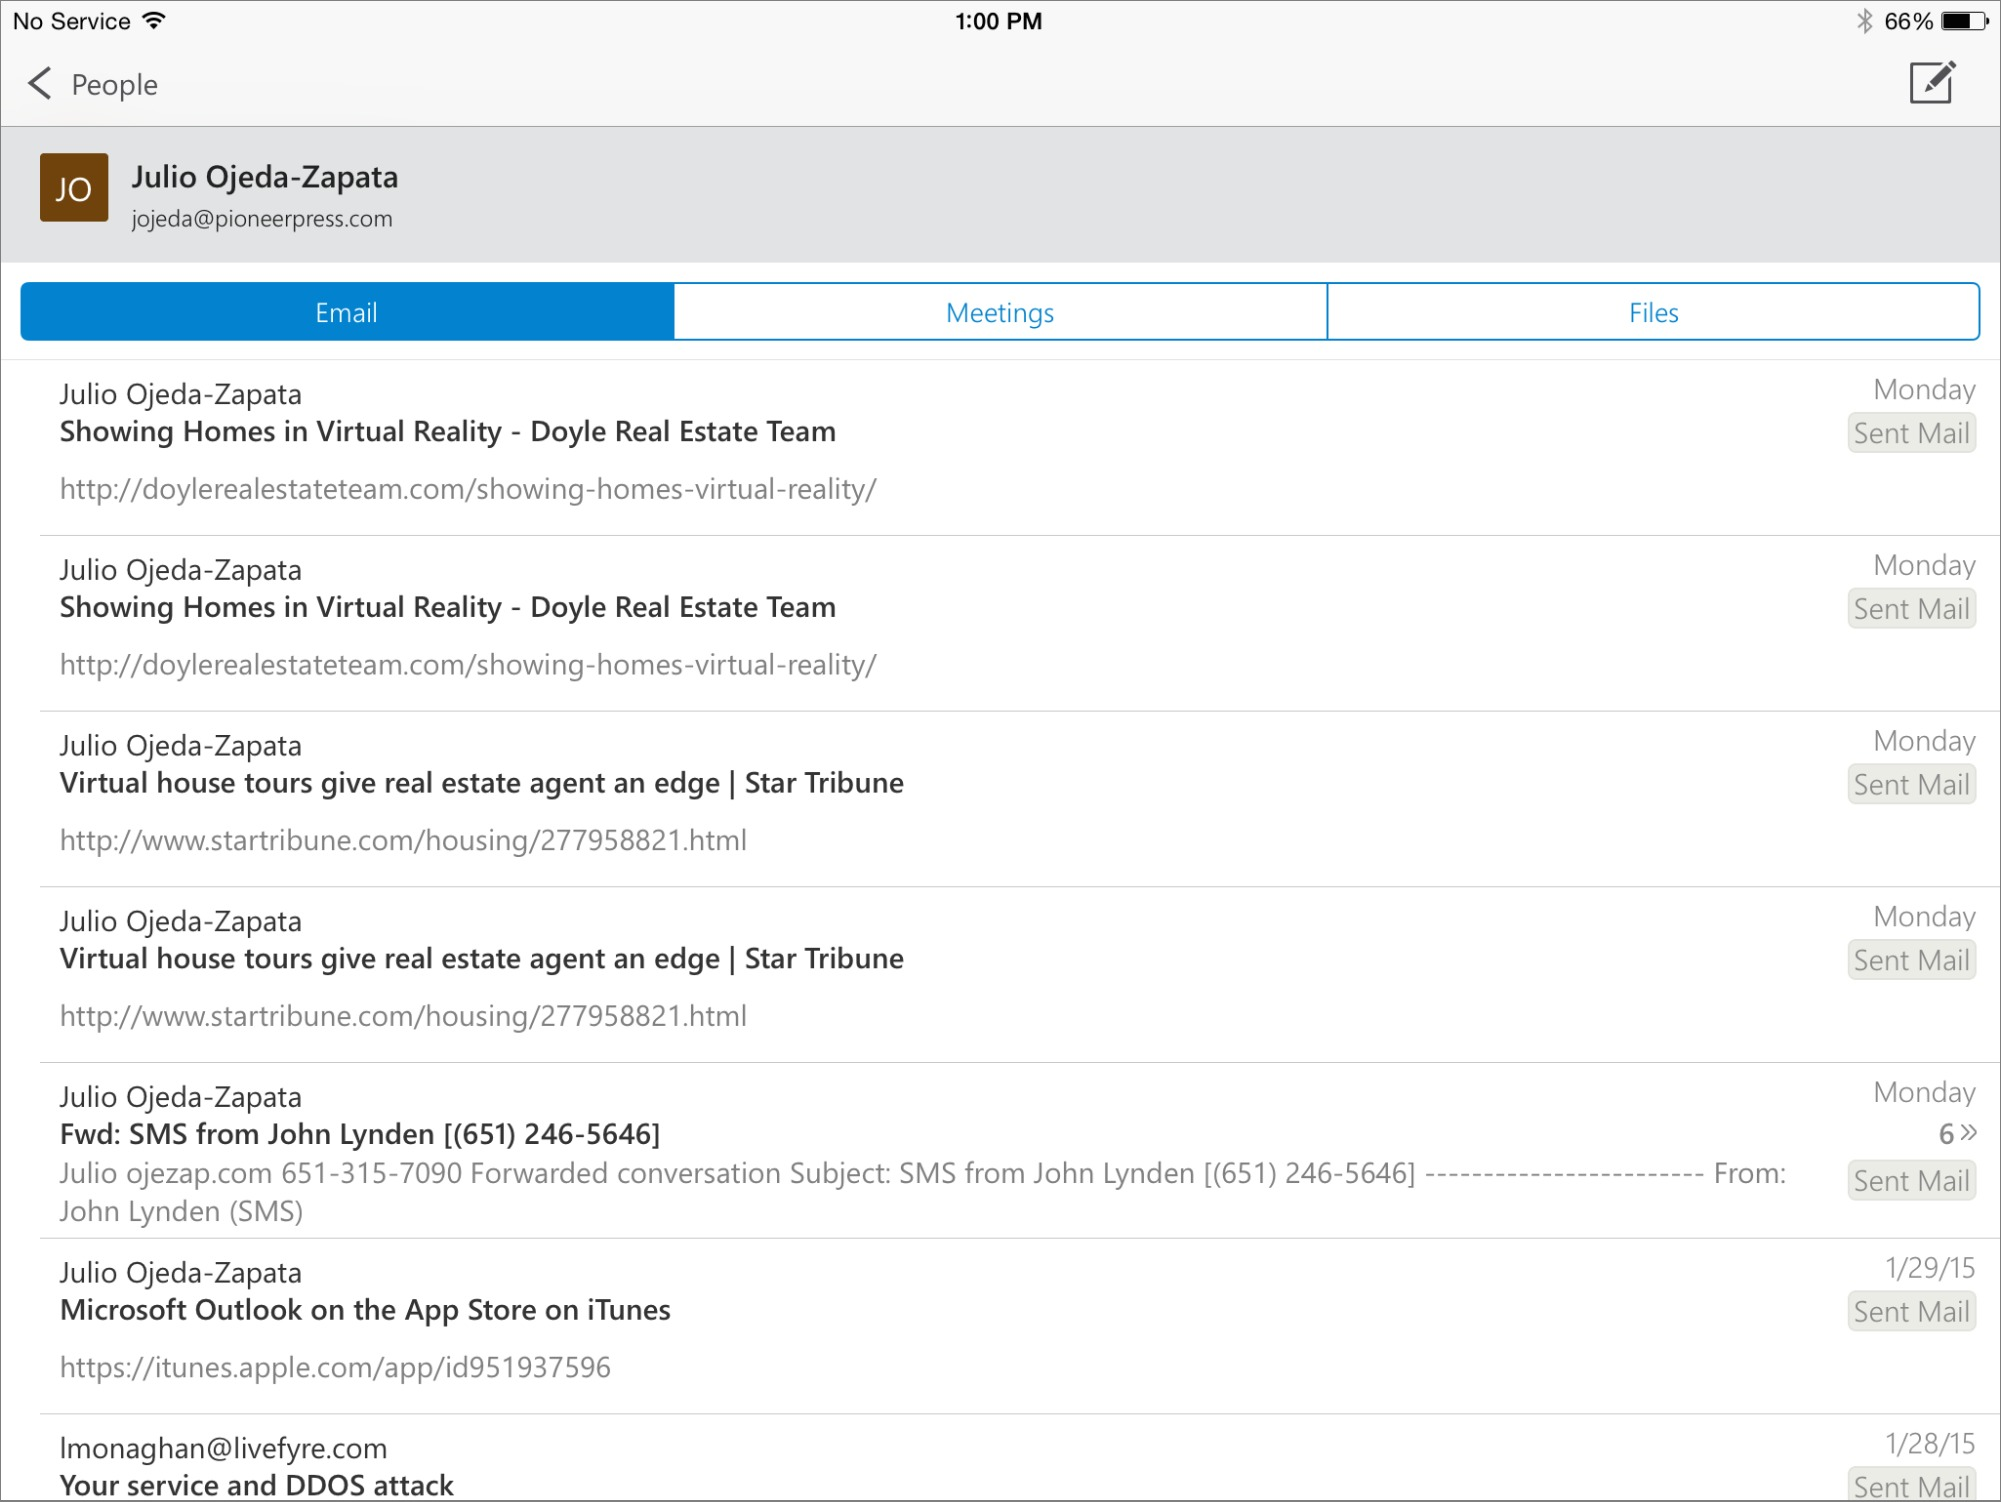 Microsoft Outlook Arrives for iOS - TidBITS